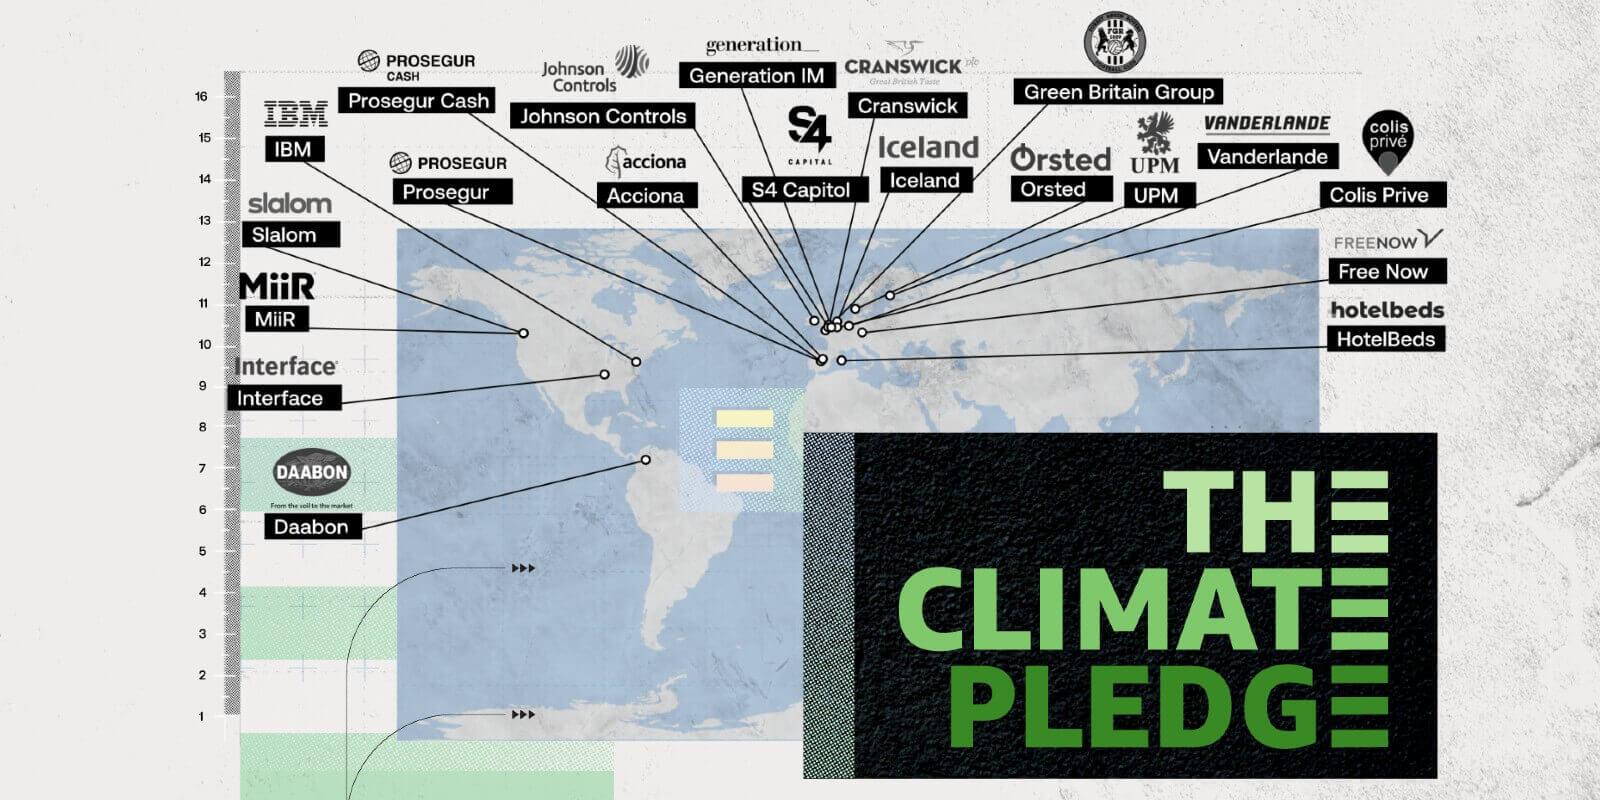 ACCIONA JOINS THE CLIMATE PLEDGE